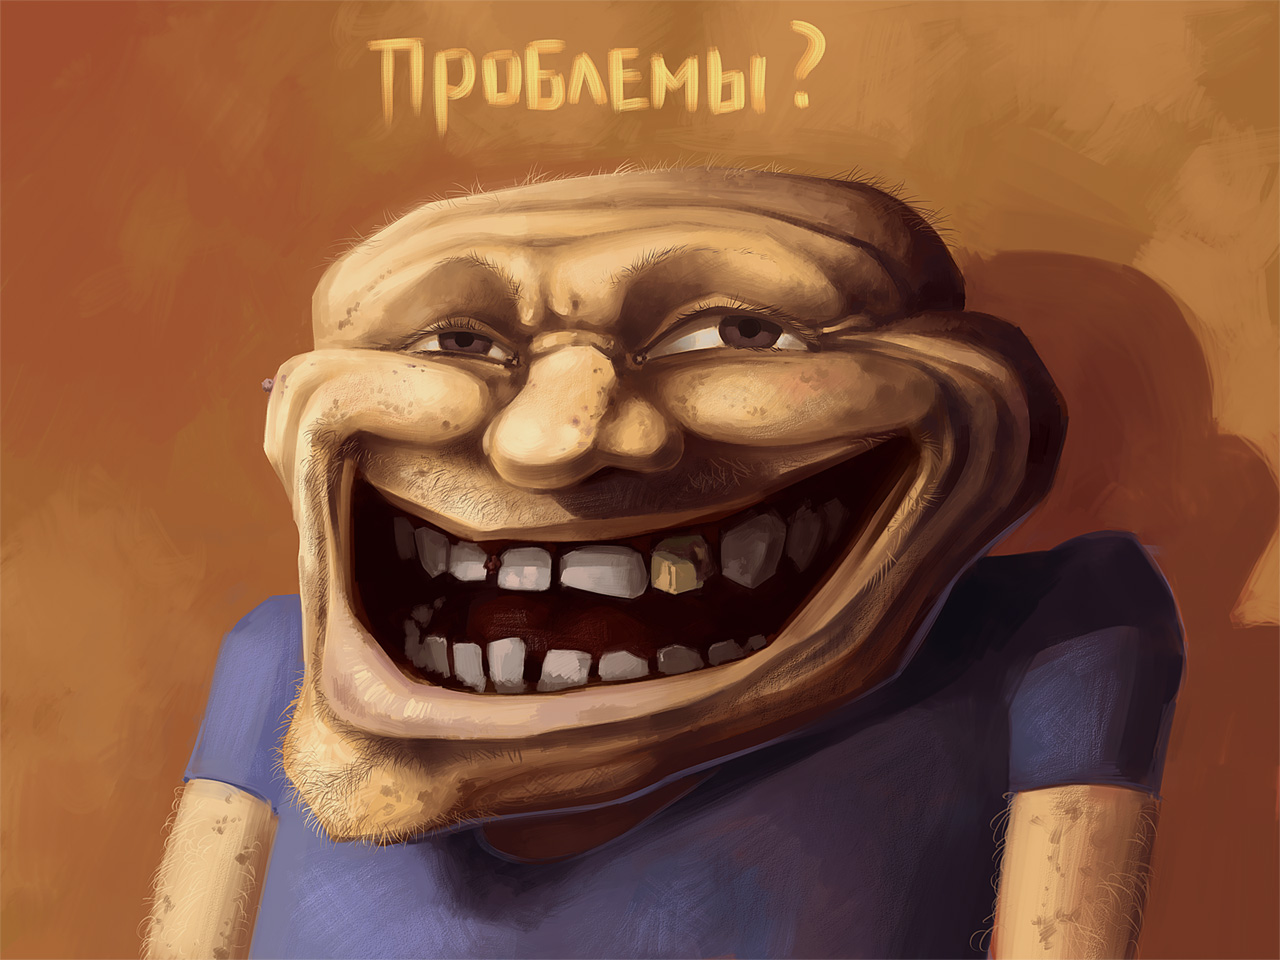 russian-meme_00278507